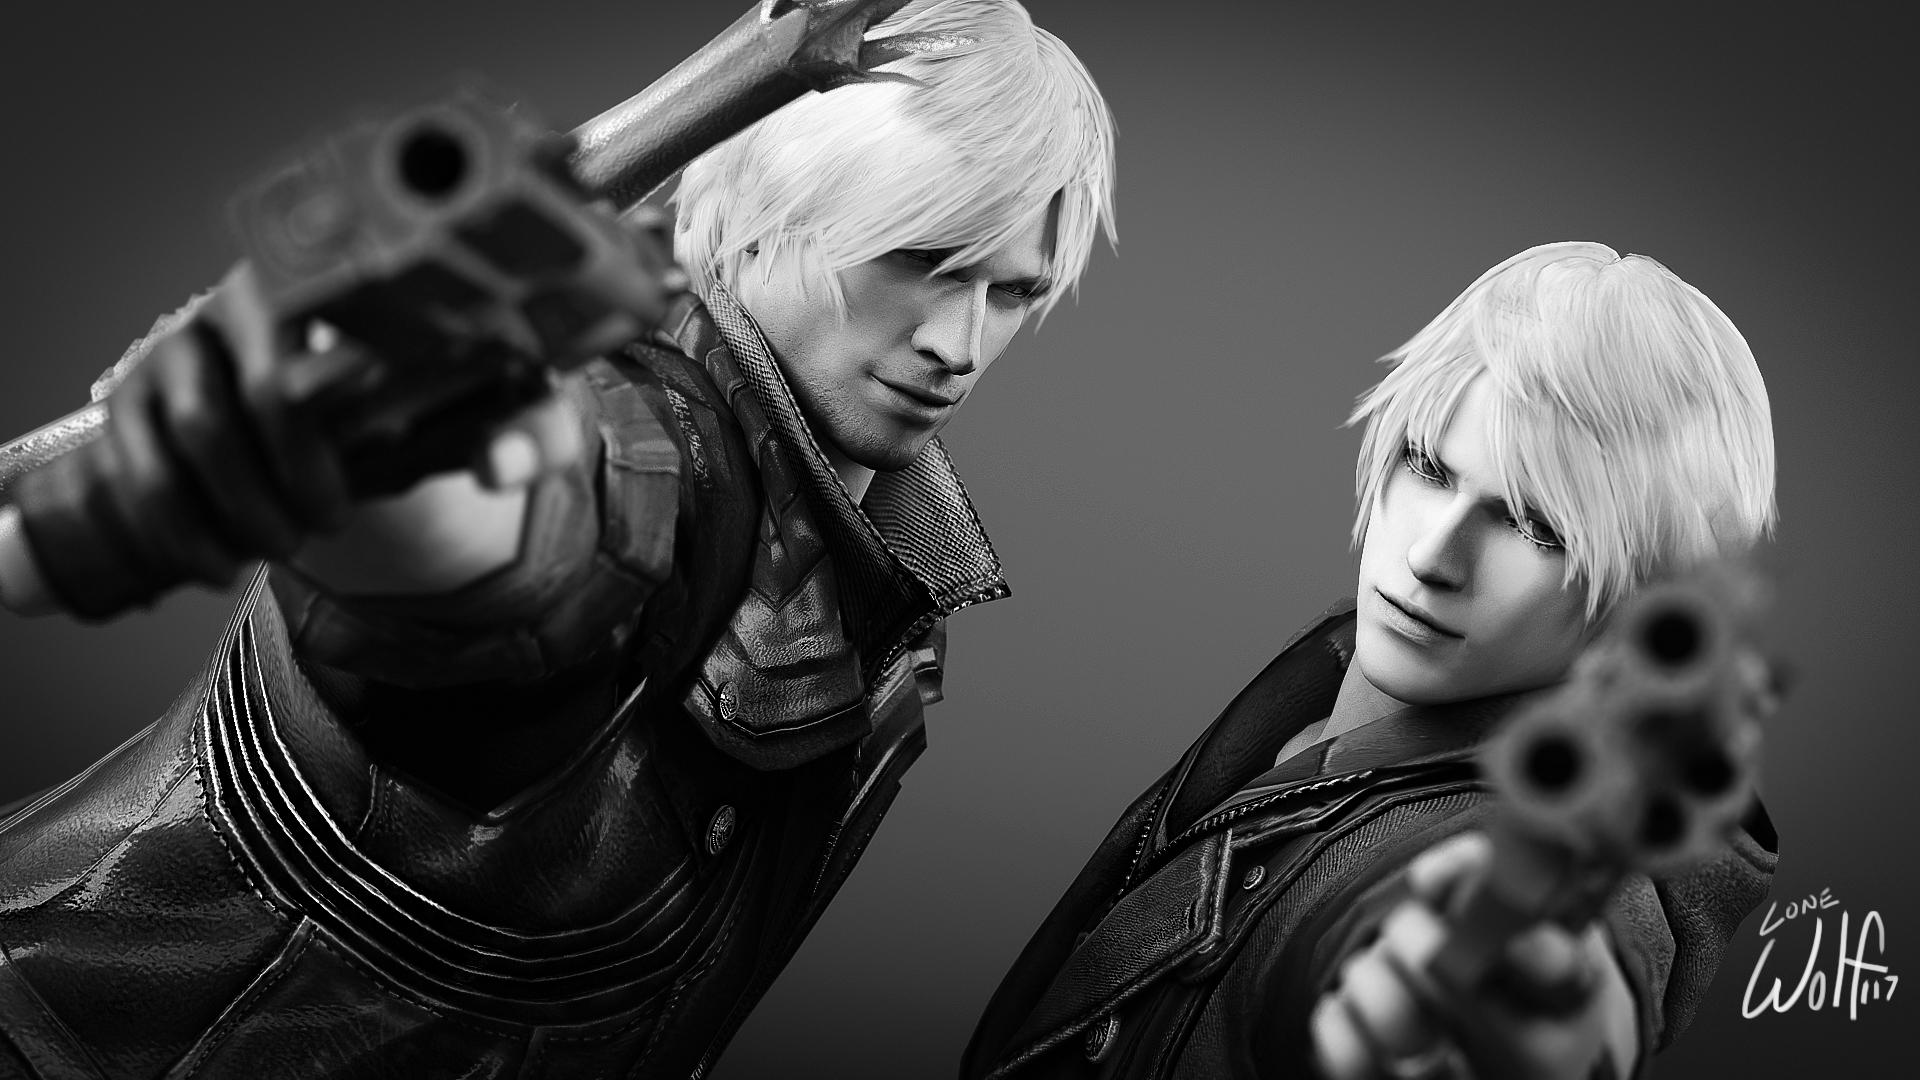 Dante and Nero: Brotherhood by LoneWolf117